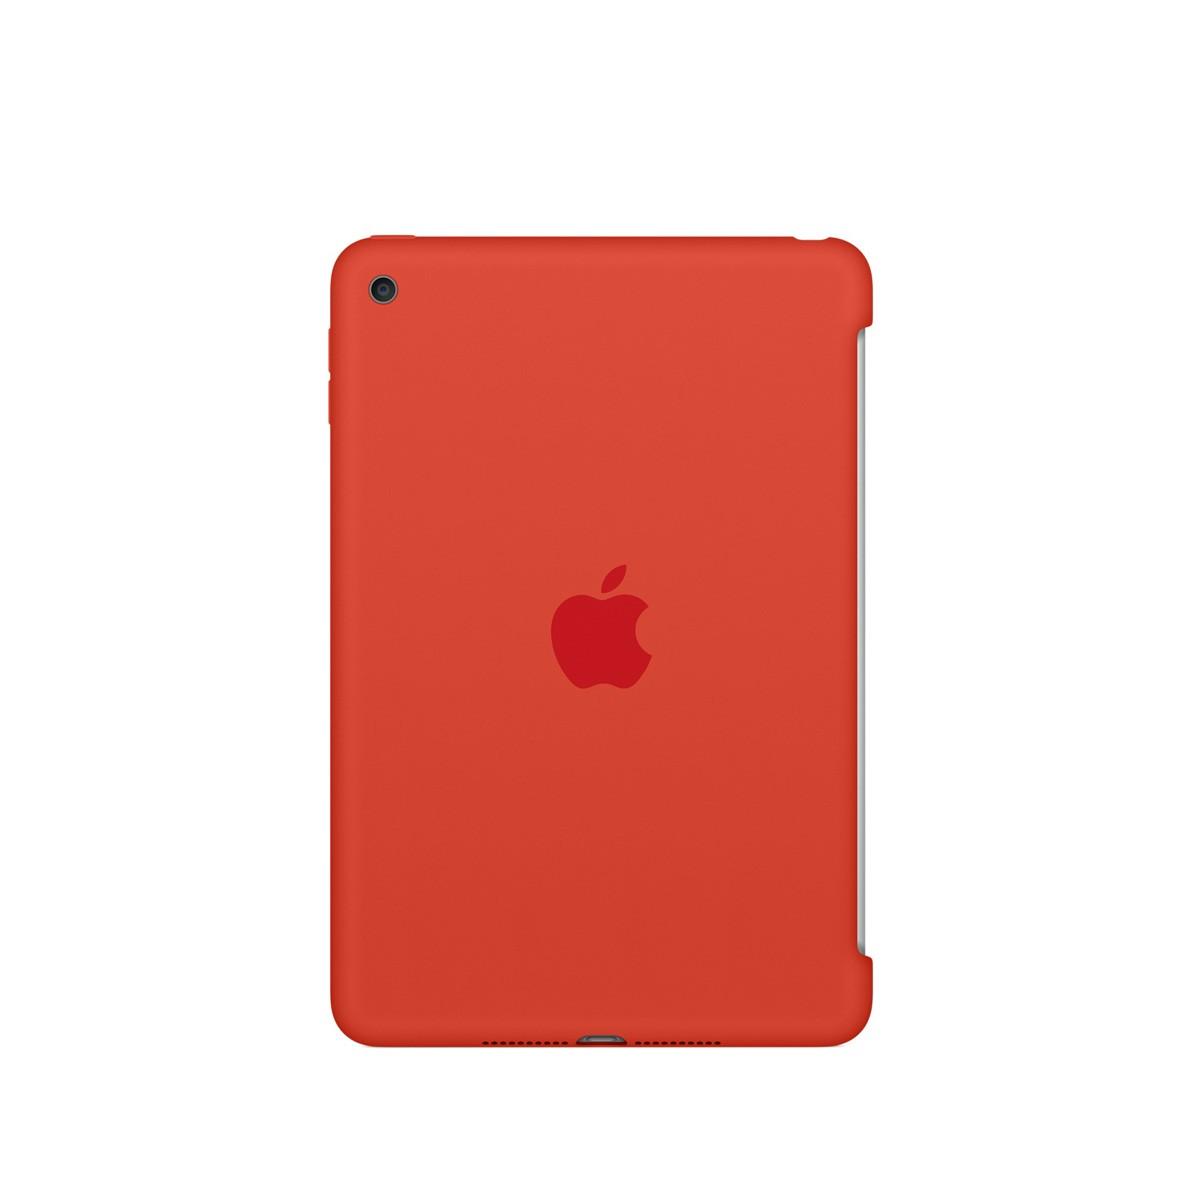 Apple Silikonové pouzdro na iPad mini 4 – oranžové mld42zm/a